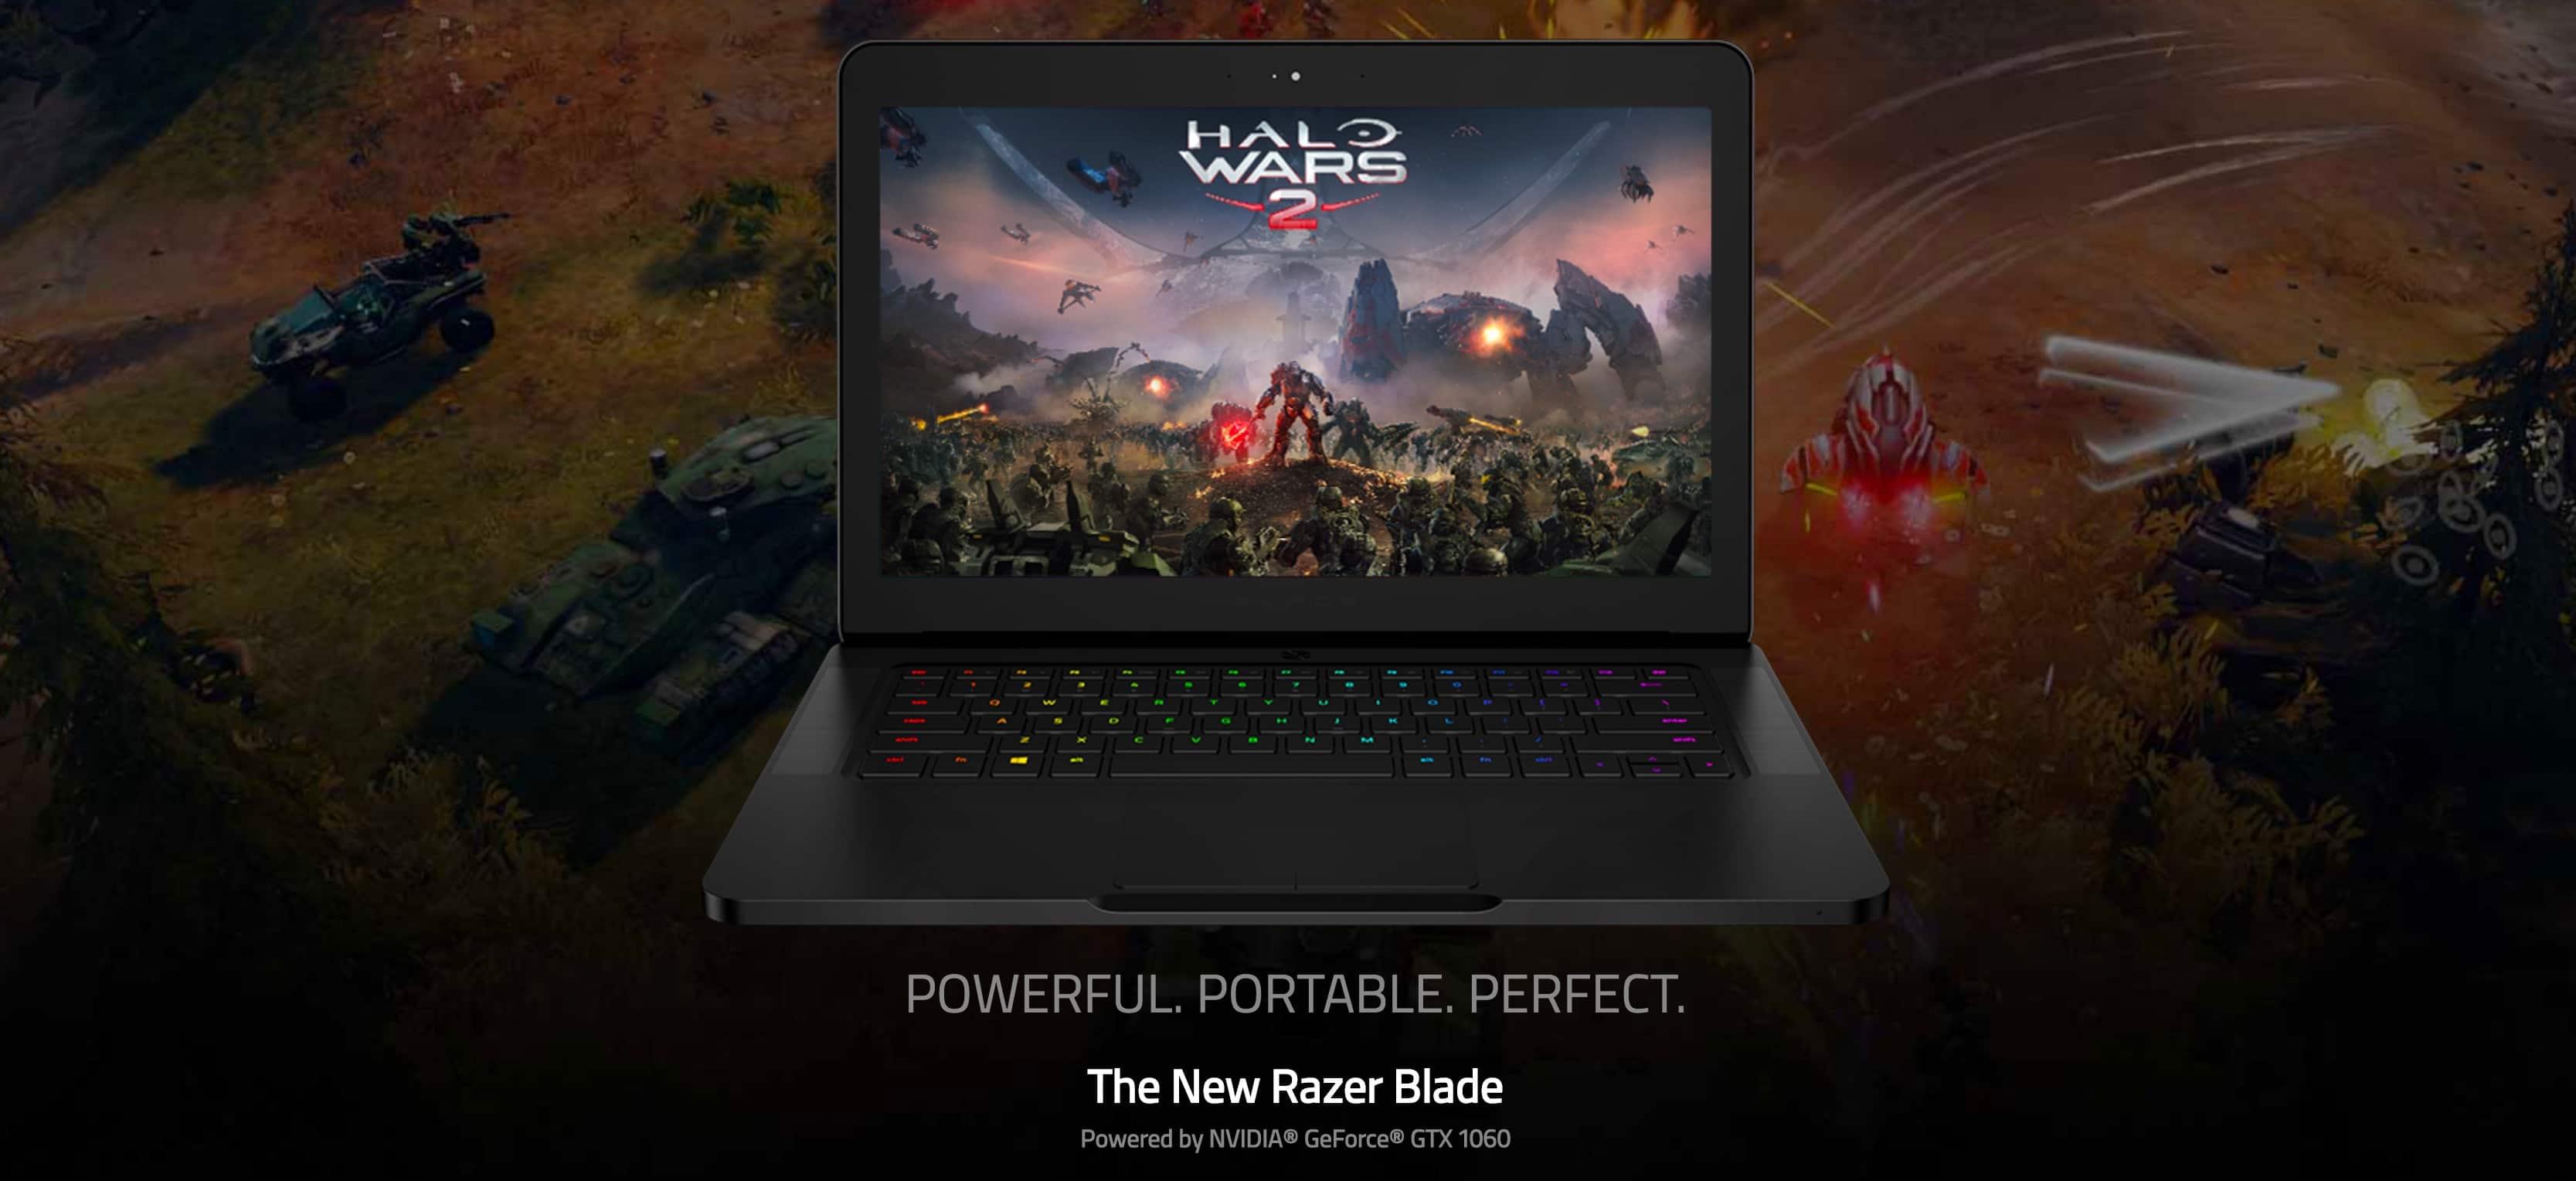 The_New_Razer_Blade_Gaming_Laptop (1)